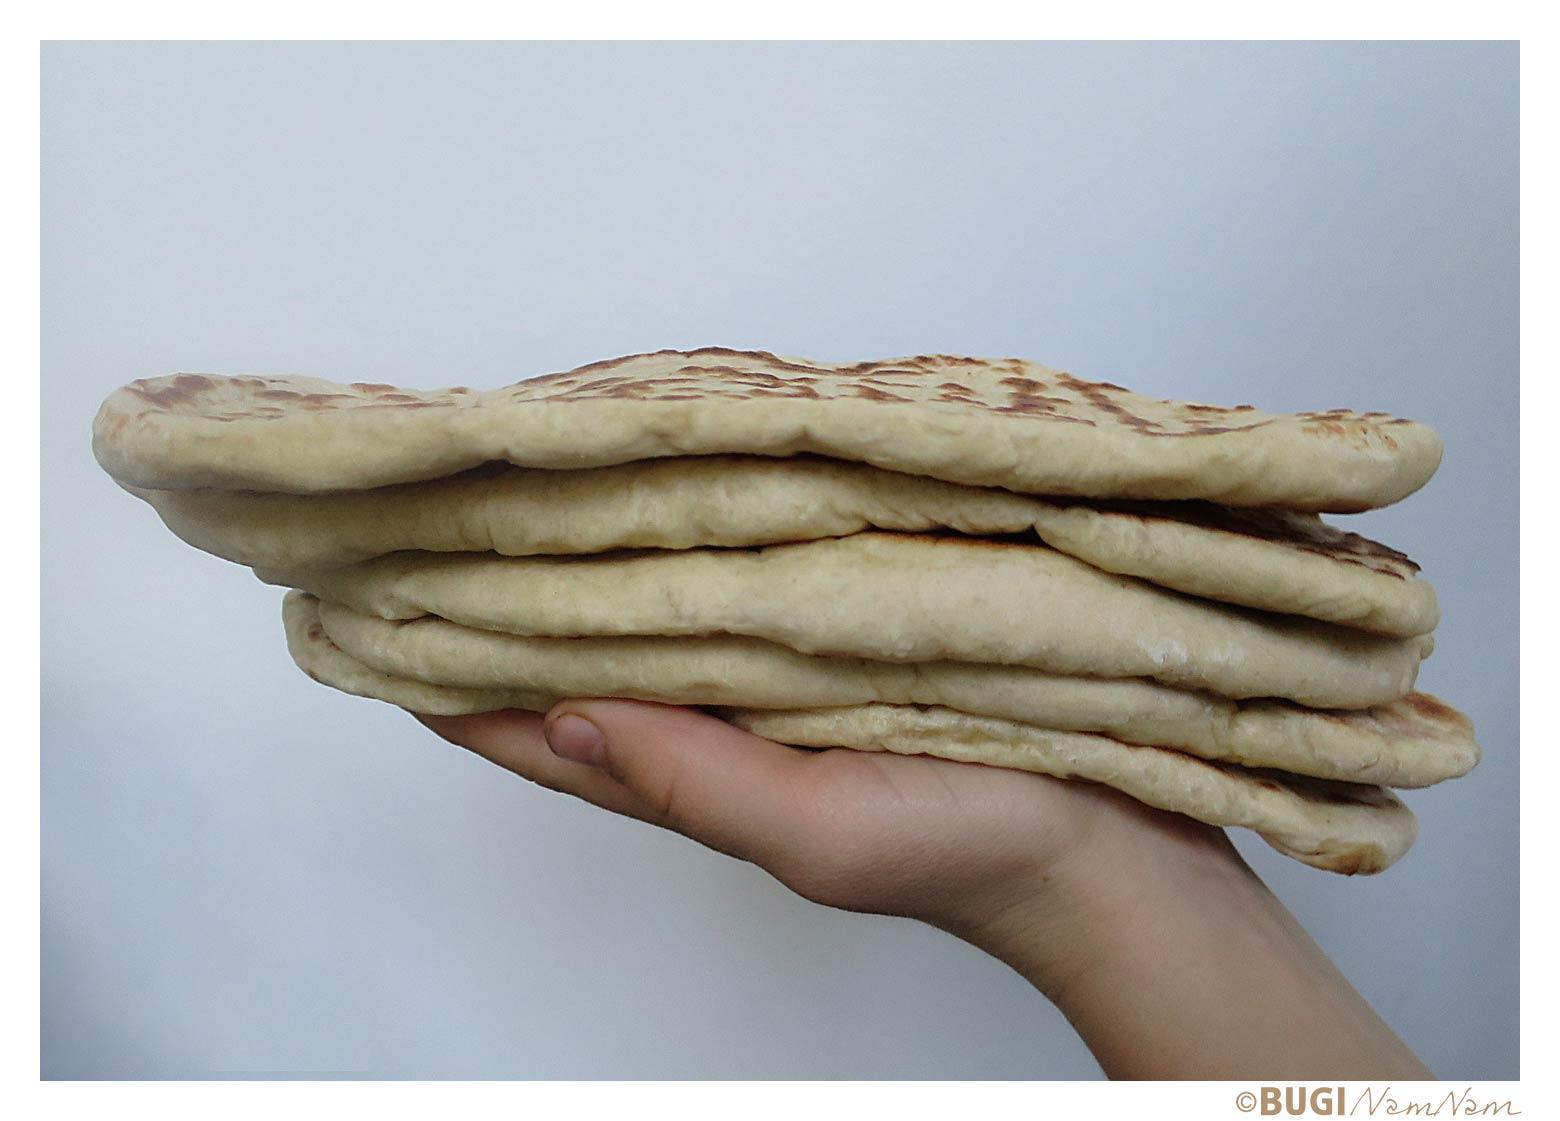 stak af naanbrød